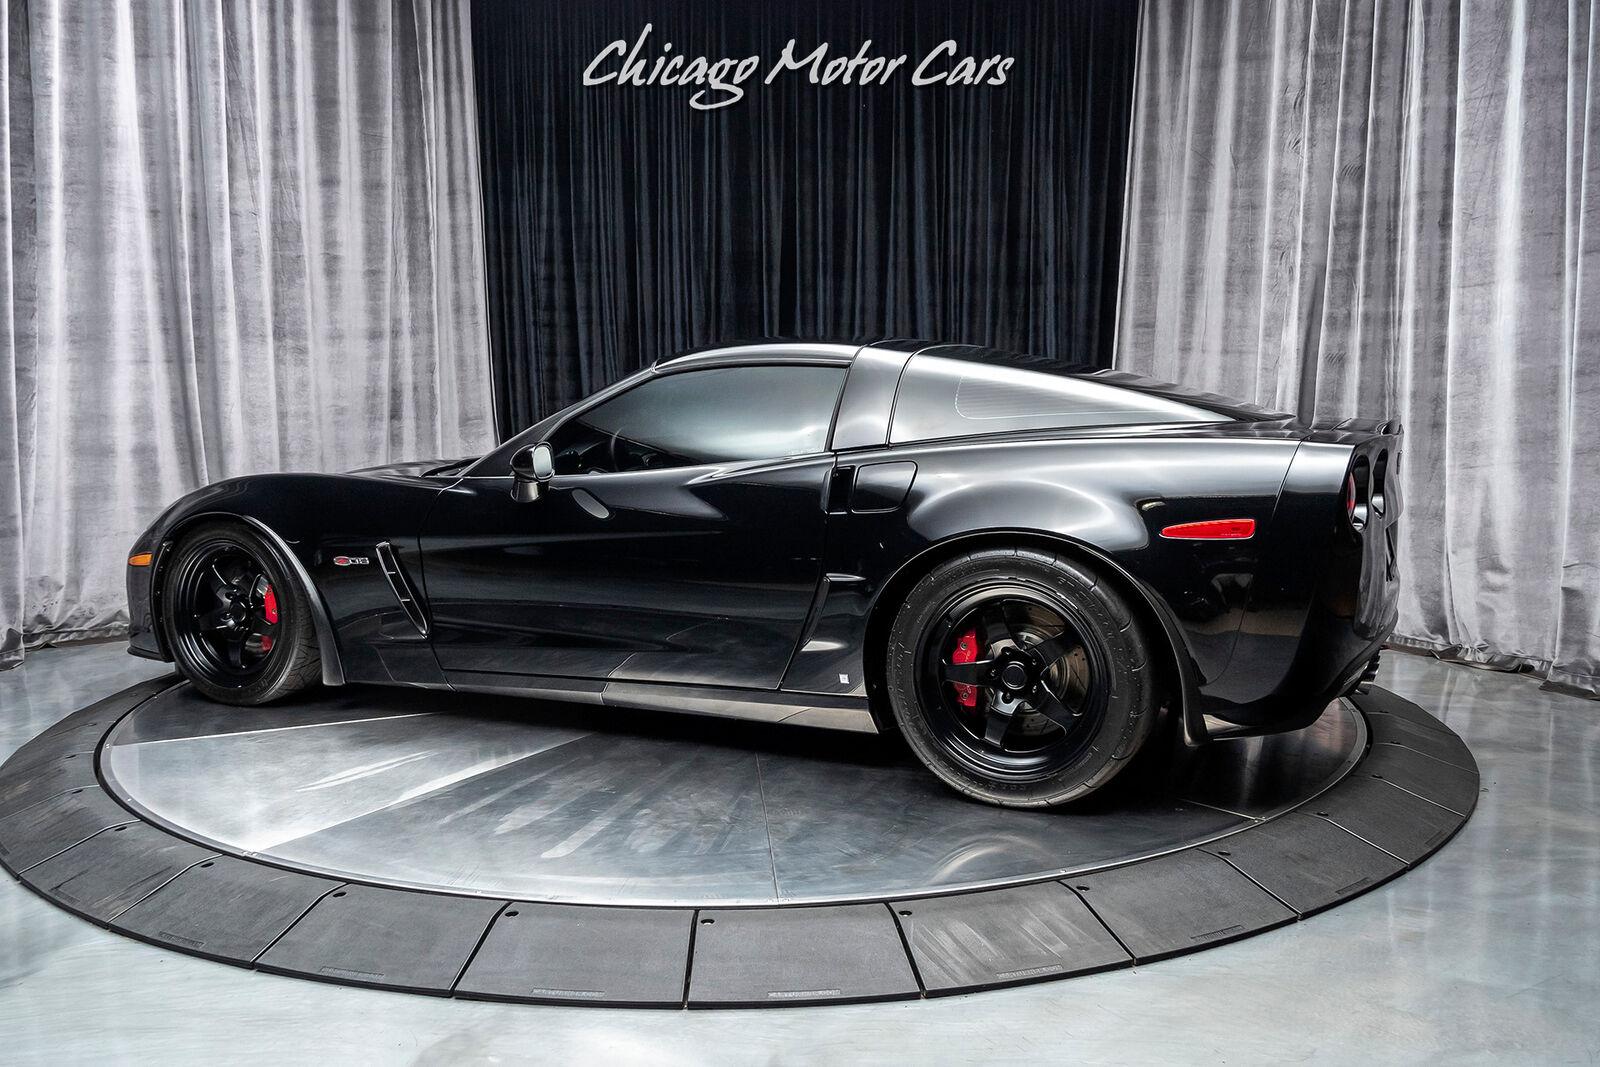 2008 Black Chevrolet Corvette Z06 3LZ | C6 Corvette Photo 3